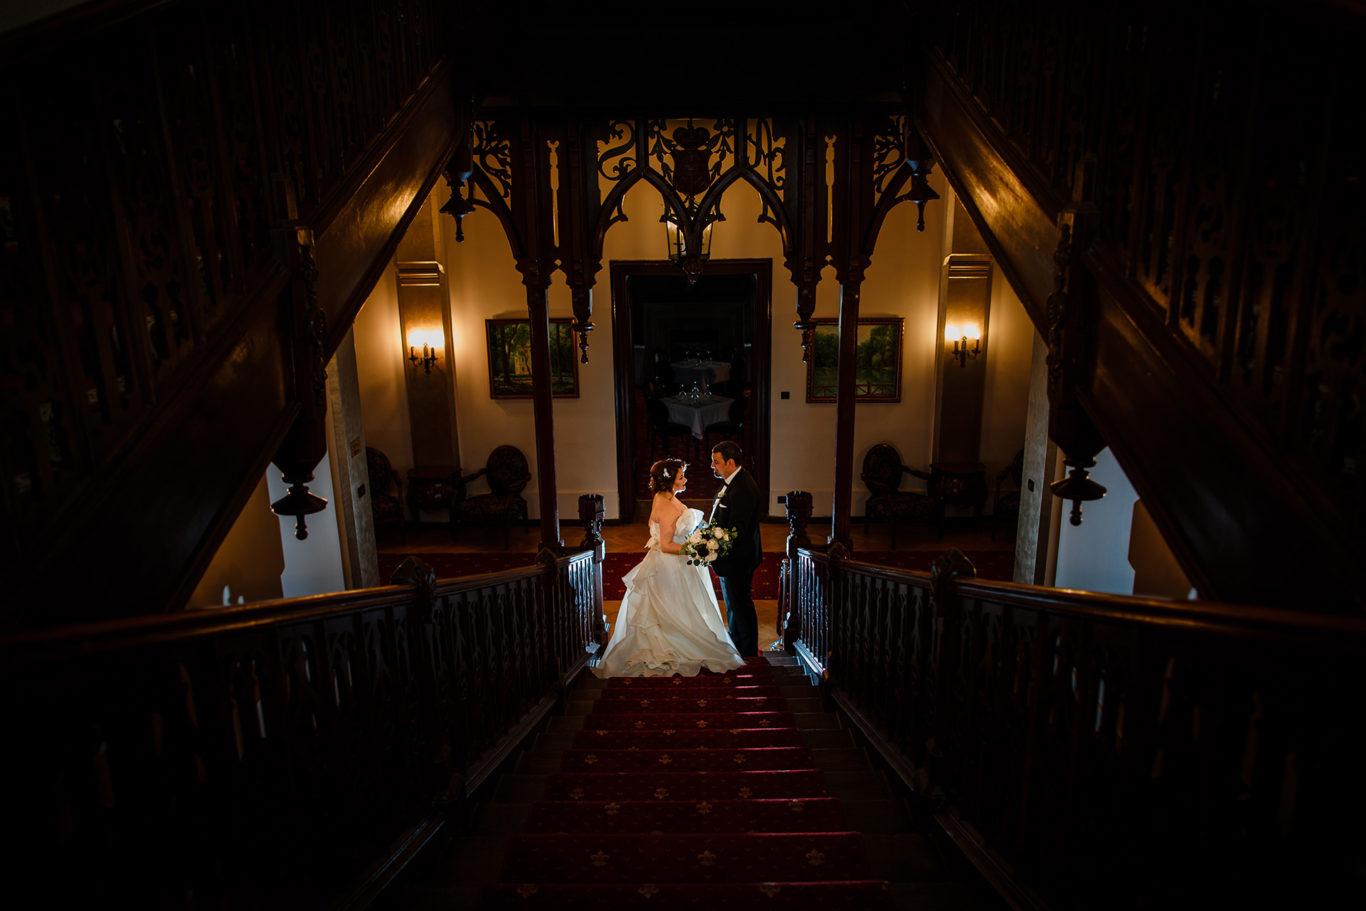 Nunta la palat - Simone + Marius - fotograf Ciprian Dumitrescu